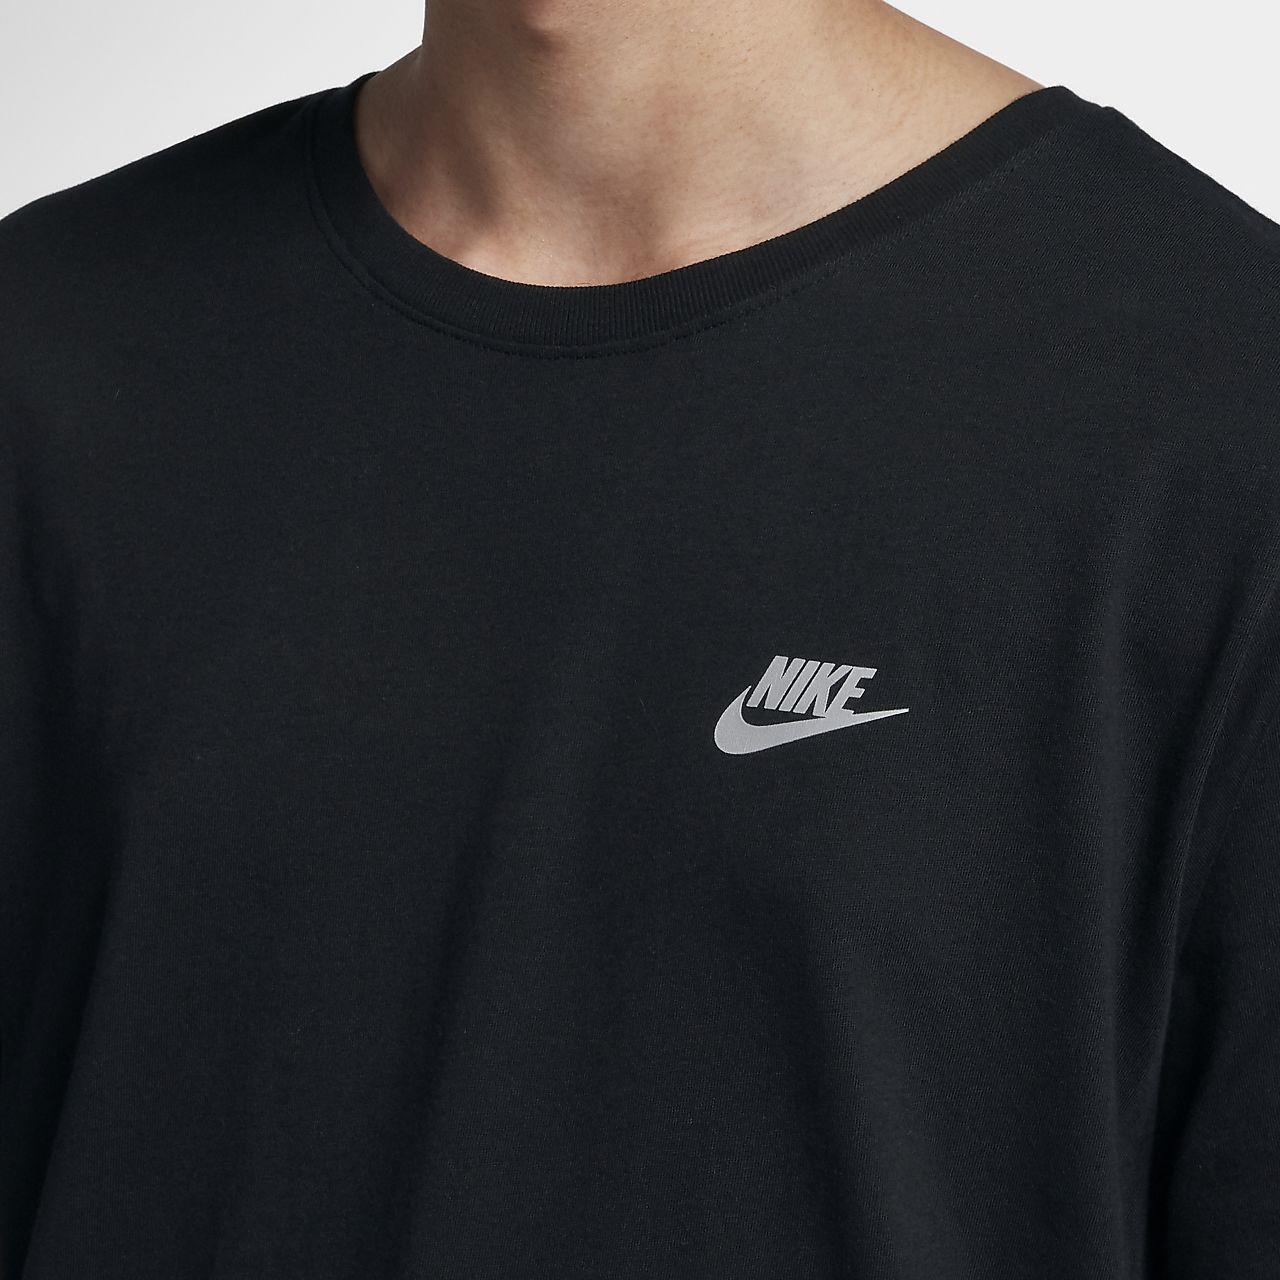 c2f6c5a67ac5 Nike Sportswear Air Max Men s T-Shirt. Nike.com GB